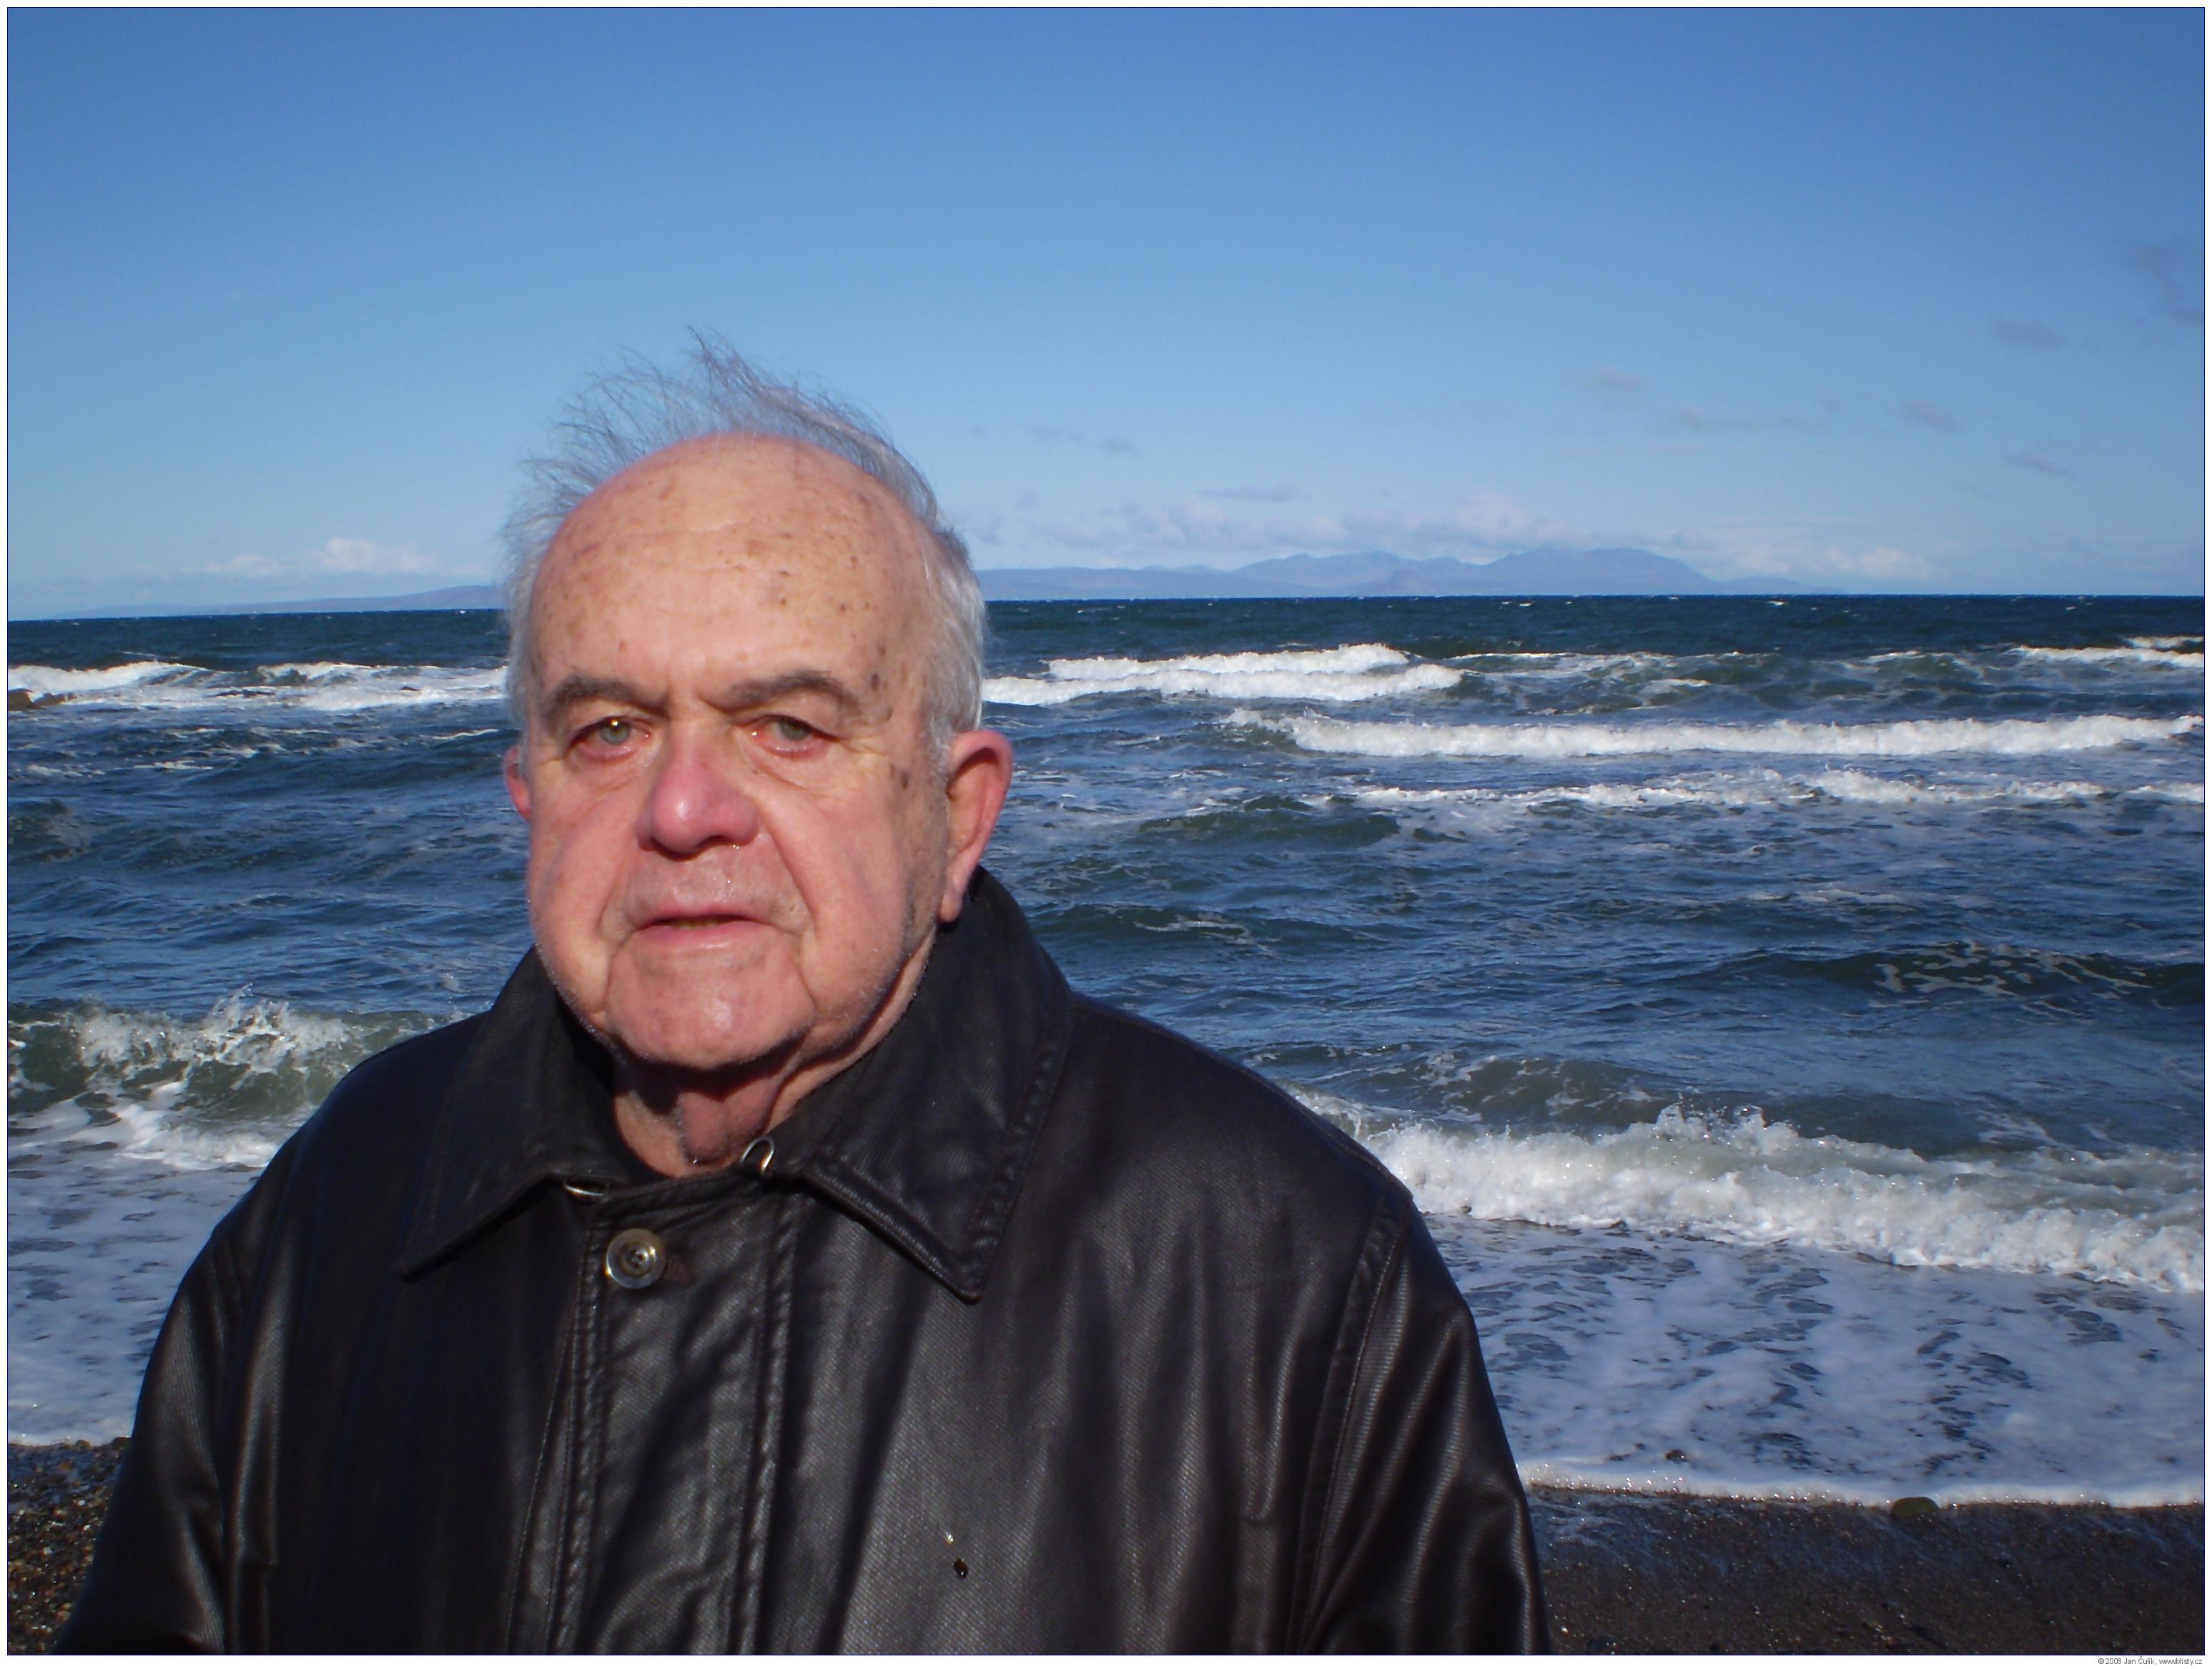 Antonín Liehm (tehdy 84) ve Skotsku v dubnu 2008